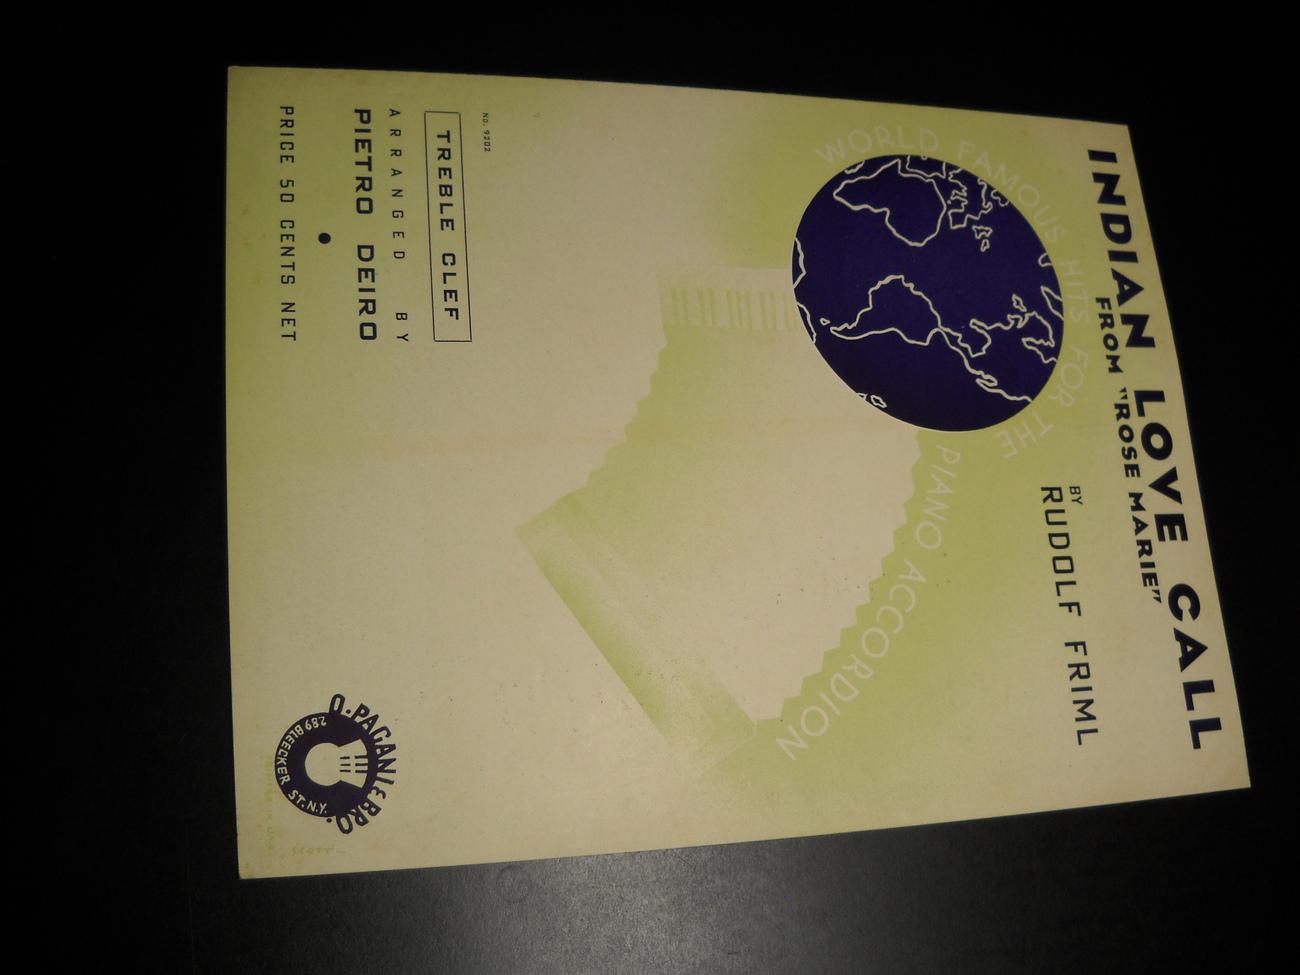 Sheet music indian love call rose marie rudolf friml 1924 o pagani   bro music 01